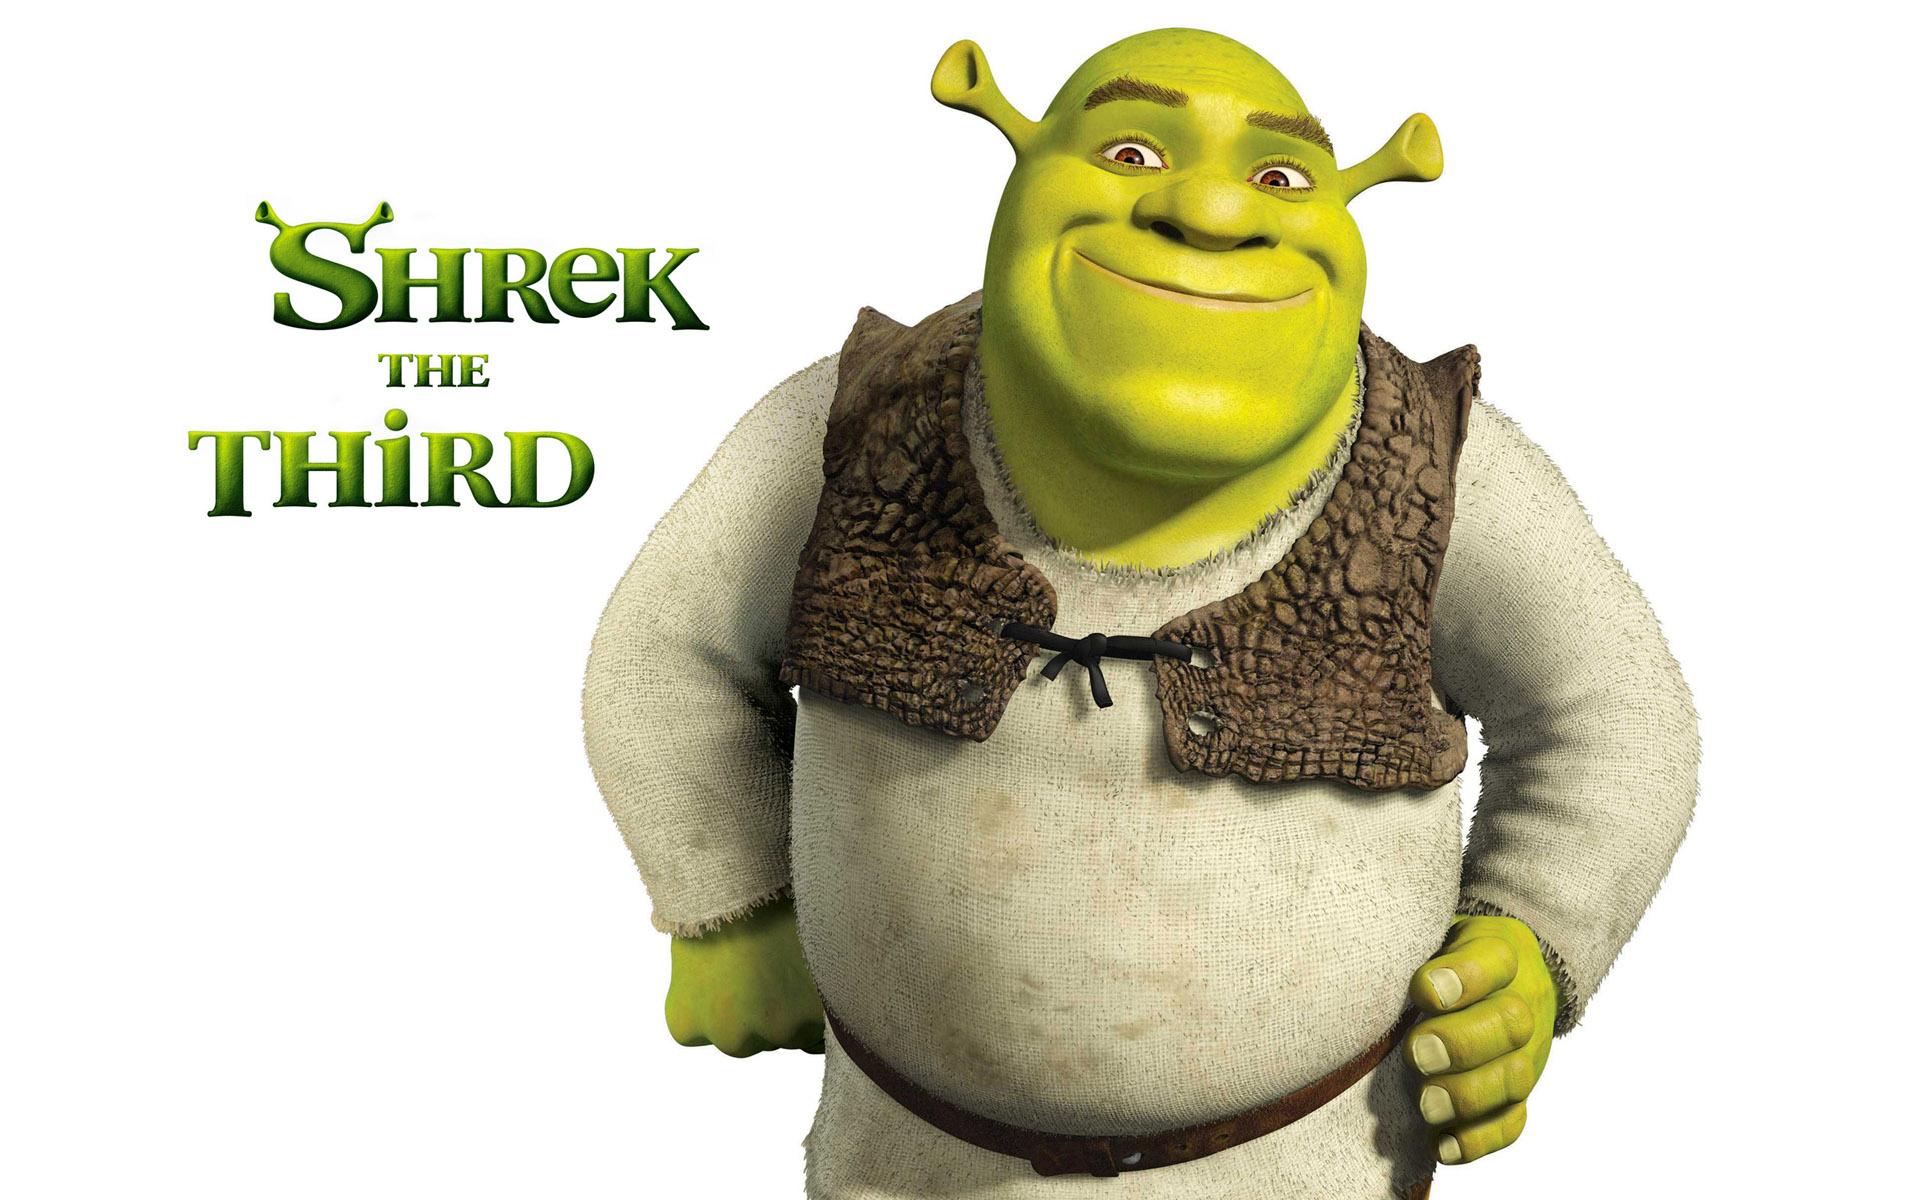 Shrek picture